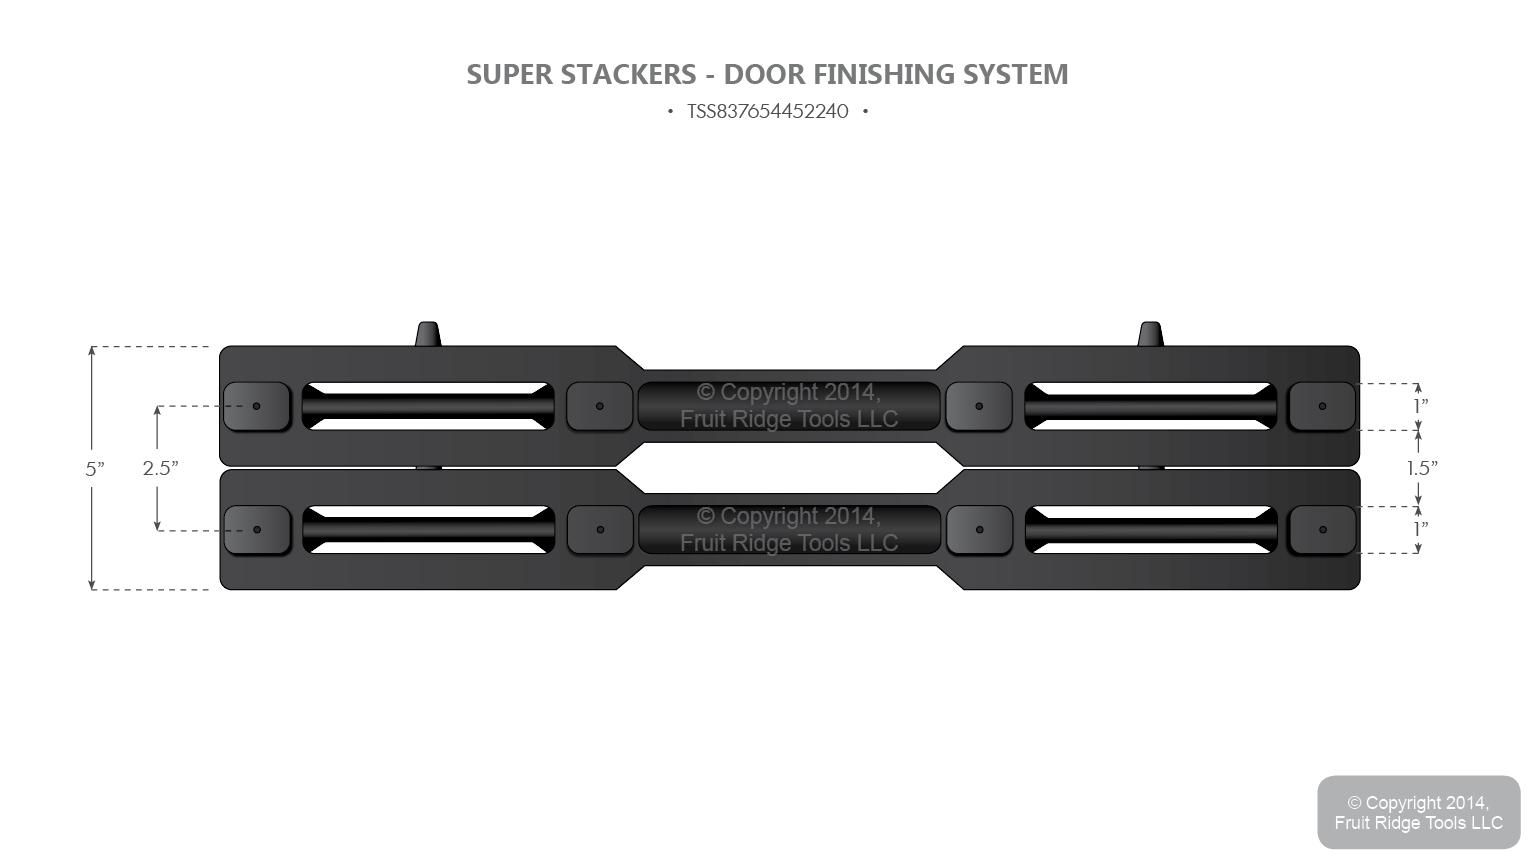 10 Super Stacker Horizontal Door Finishing System for Standard and Bi-Fold Doors  sc 1 st  eBay & 10 Super Stacker Horizontal Door Finishing System for Standard and ... pezcame.com